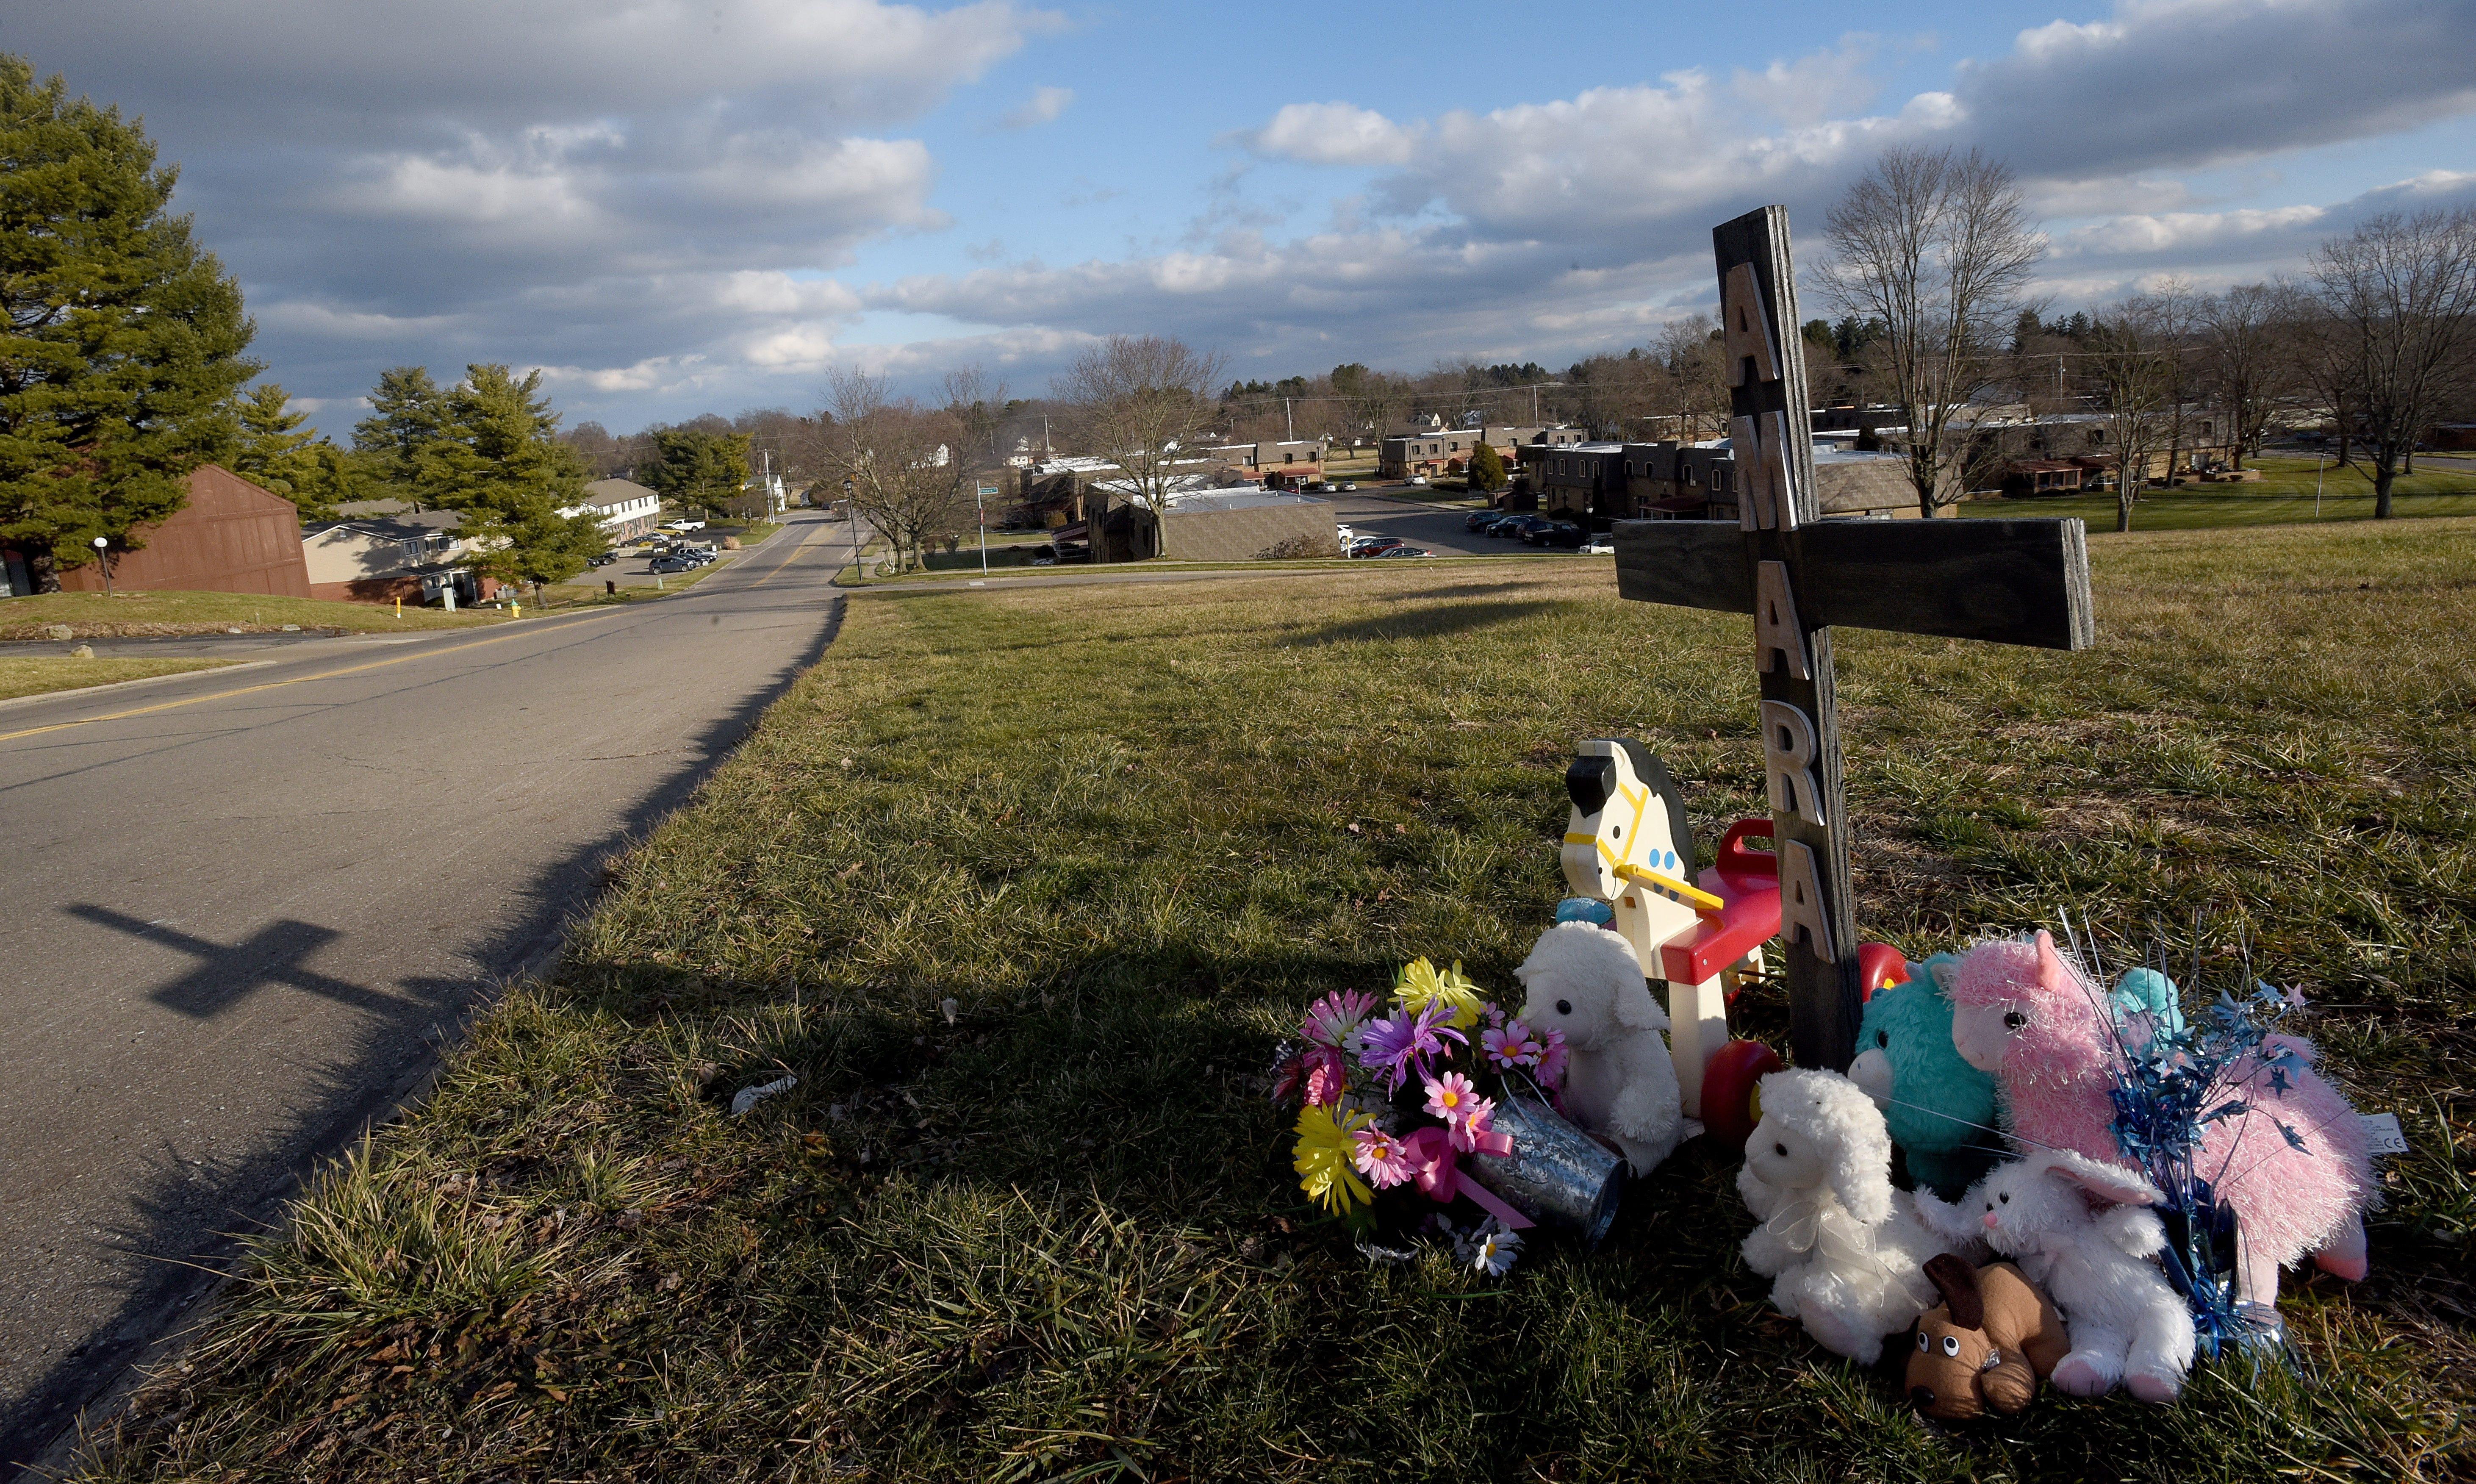 Recent Pedestrian Fatalities Show Danger Of Streets Without Sidewalks